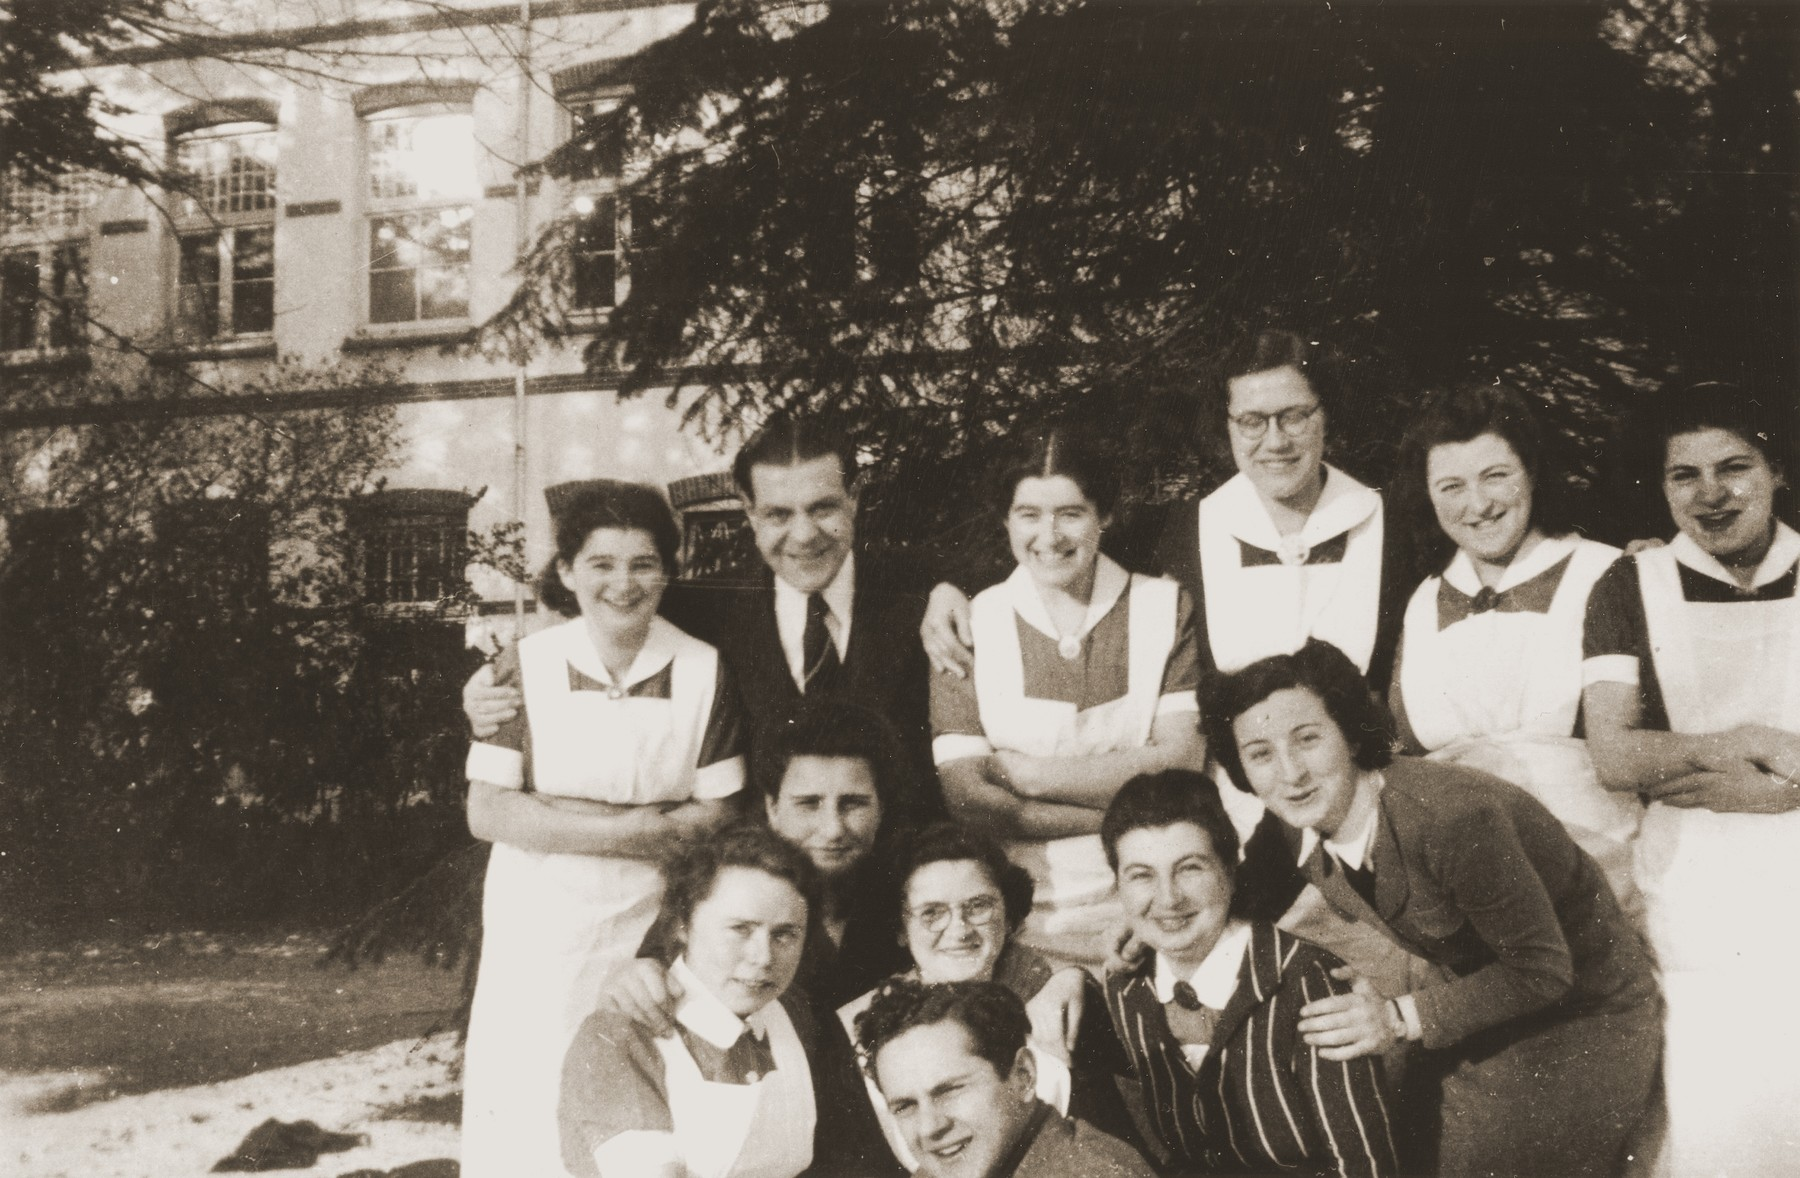 Group portrait of doctors and nurses at the Jewish psychiatric hospital in Apeldoorn [Het Apeldoornse Bos].  Among those pictured is Renee (Sara) Meijer.